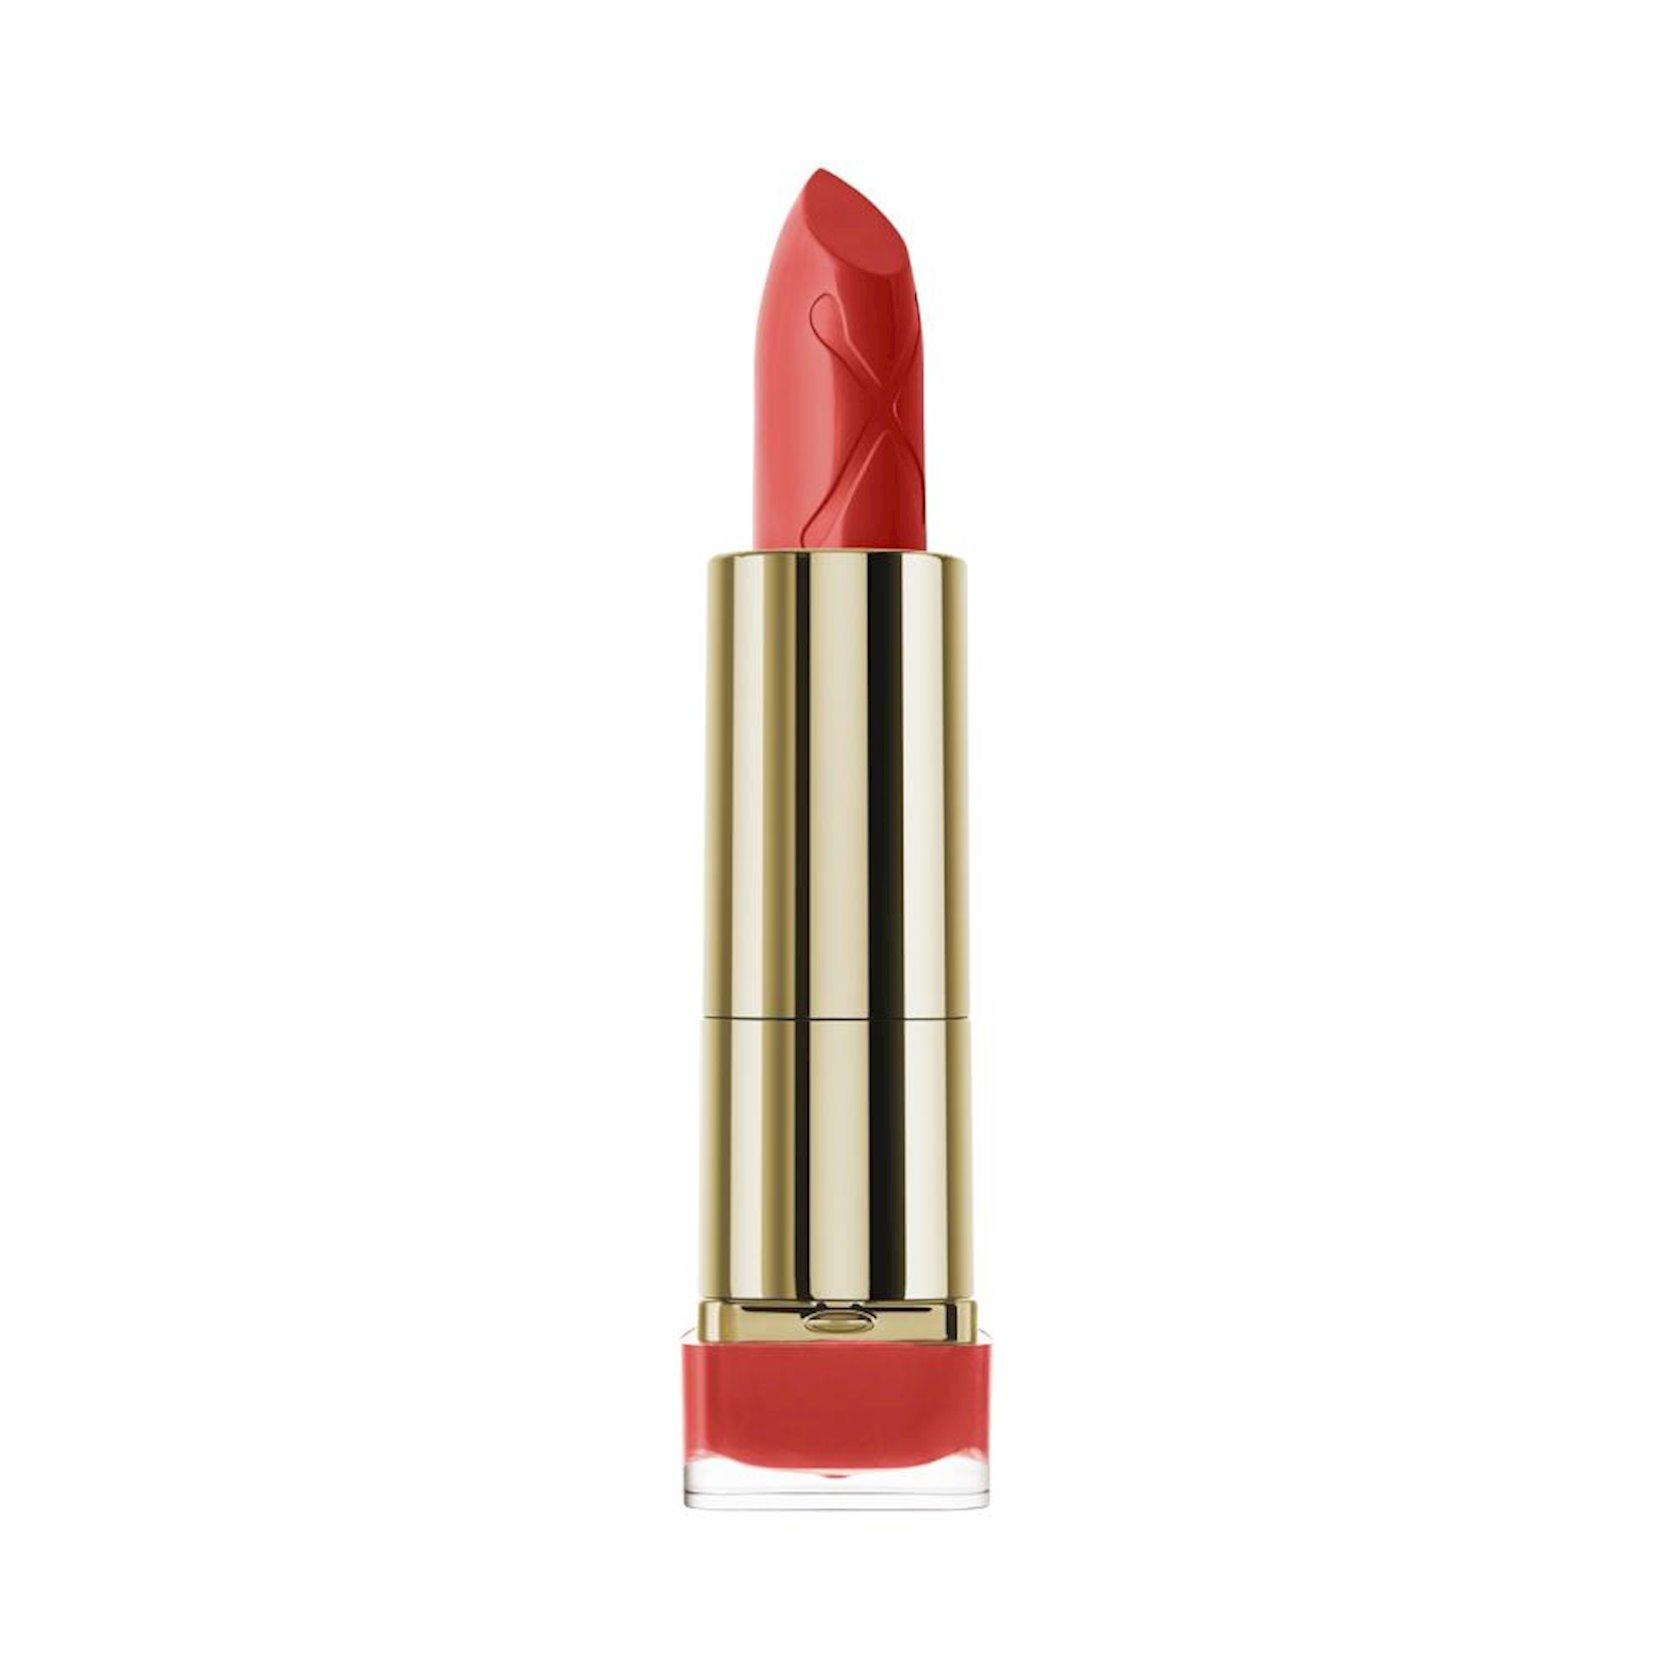 Dodaq pomadası Max Factor Colour Elixir Lipstick 065 Tangerine 4.8 q